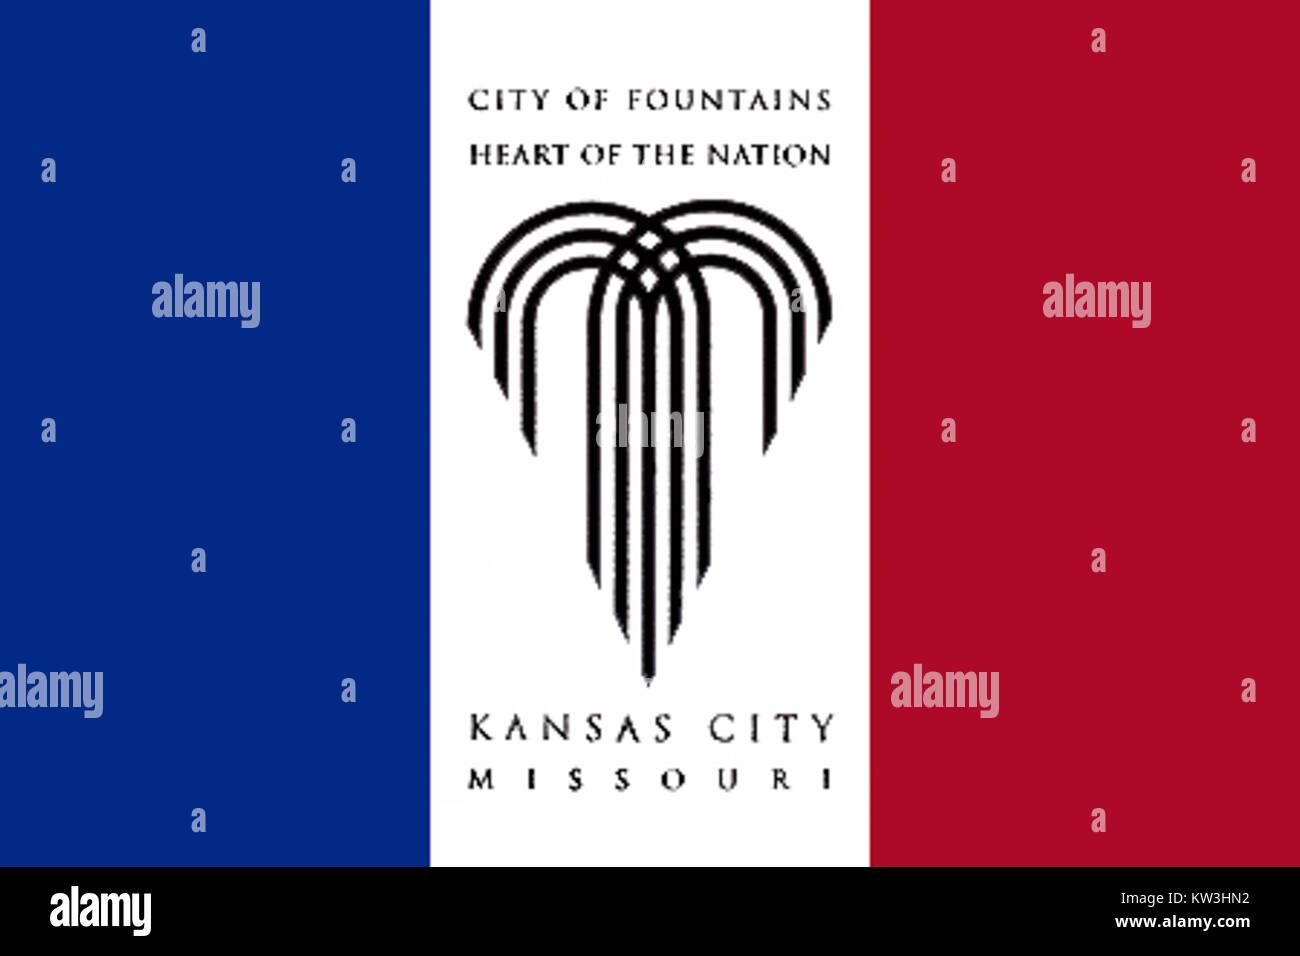 Vintage Kansas City Imágenes De Stock & Vintage Kansas City Fotos De ...